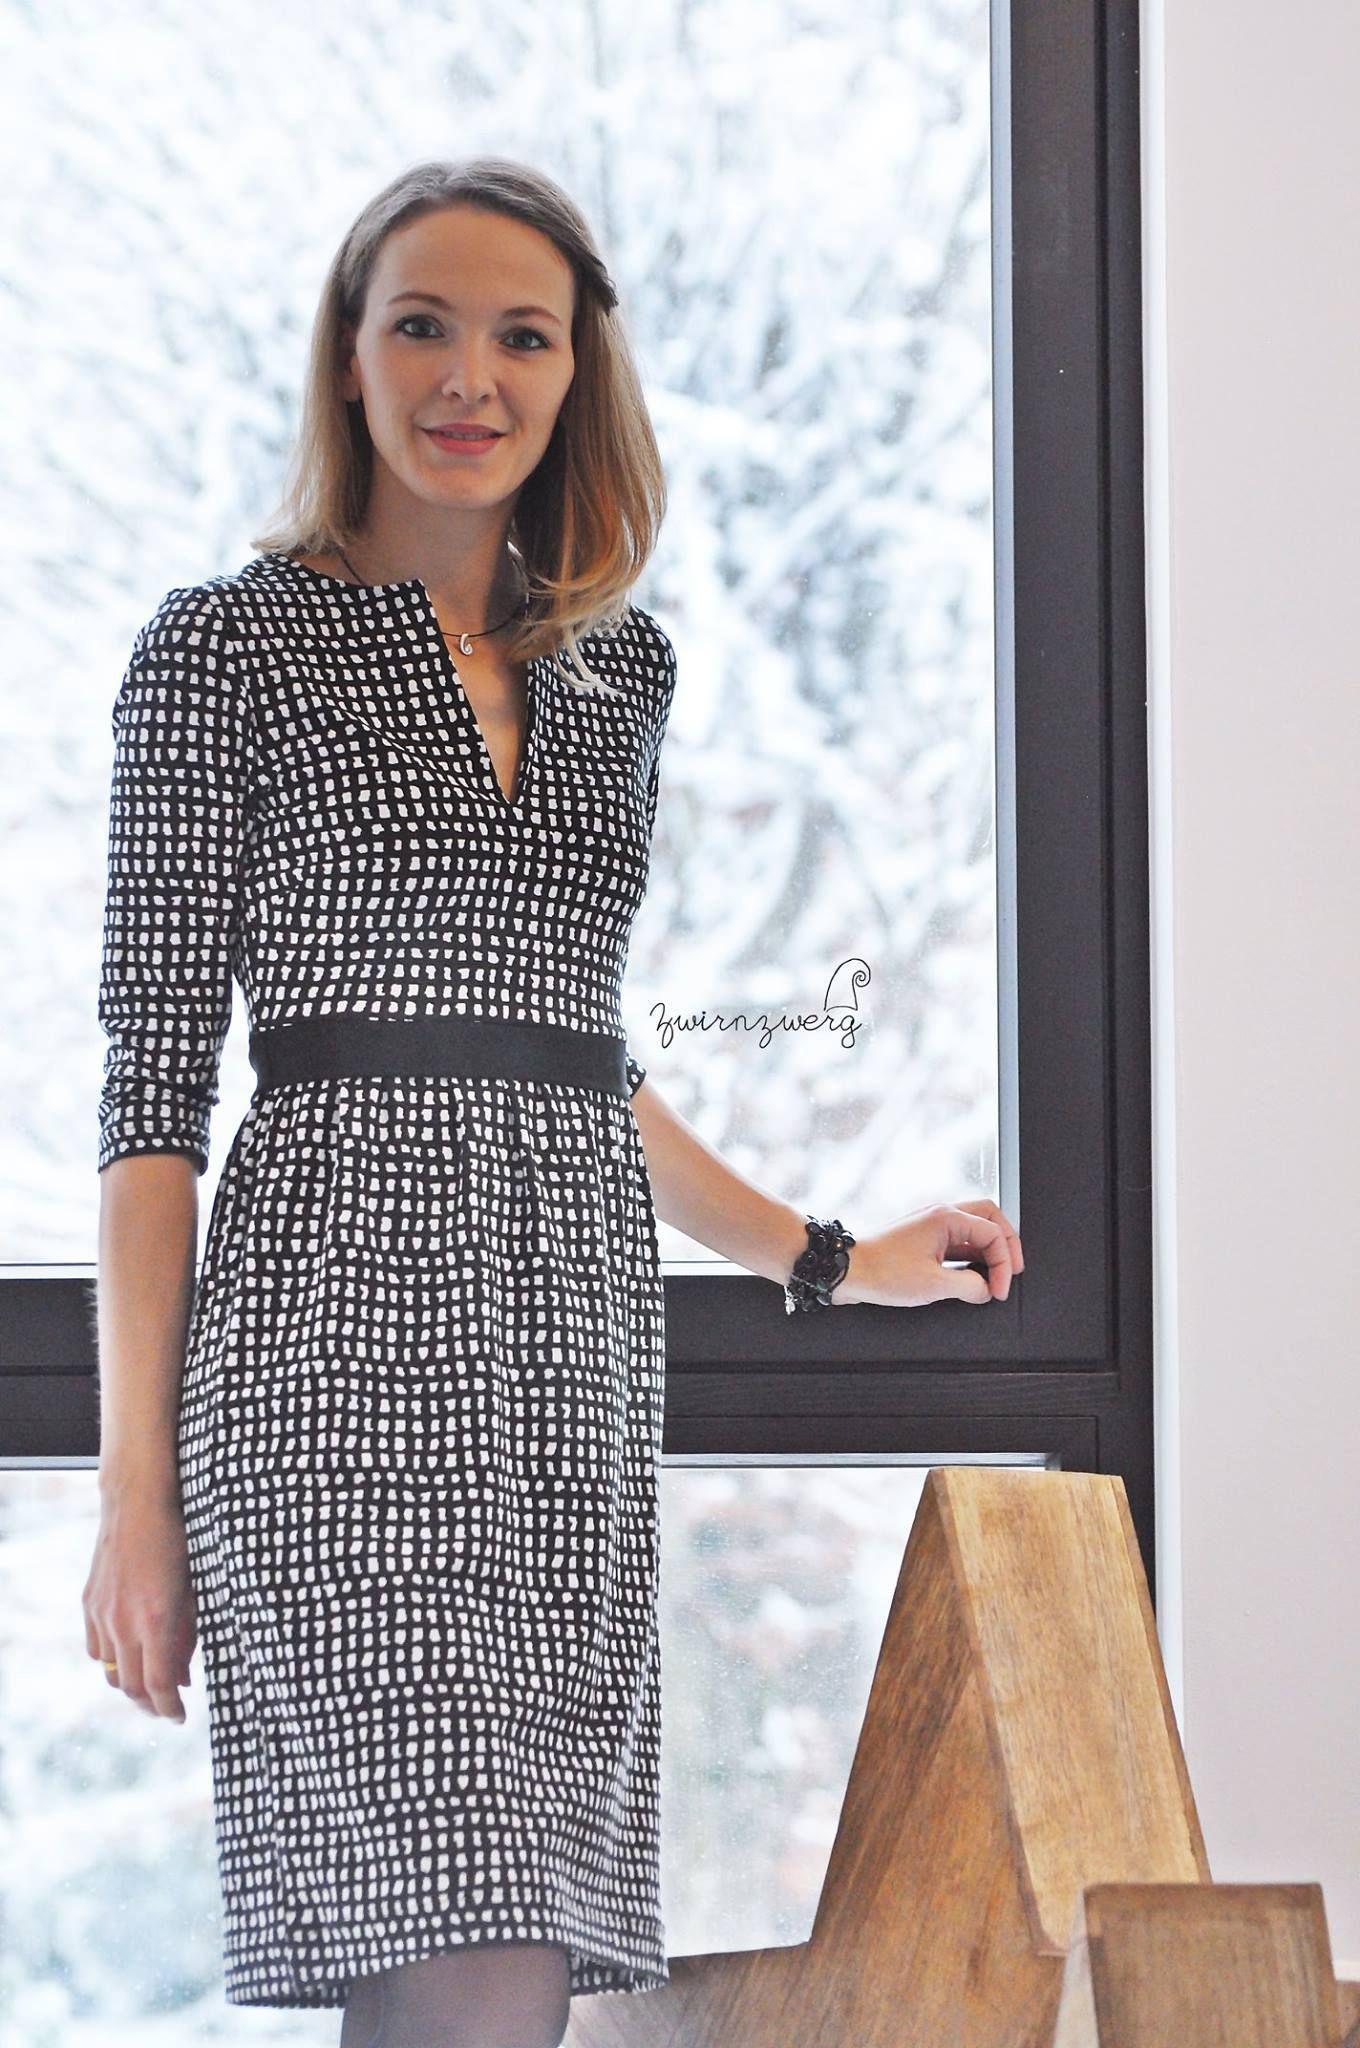 17 Fantastisch Edle Damen Kleider DesignDesigner Kreativ Edle Damen Kleider Vertrieb